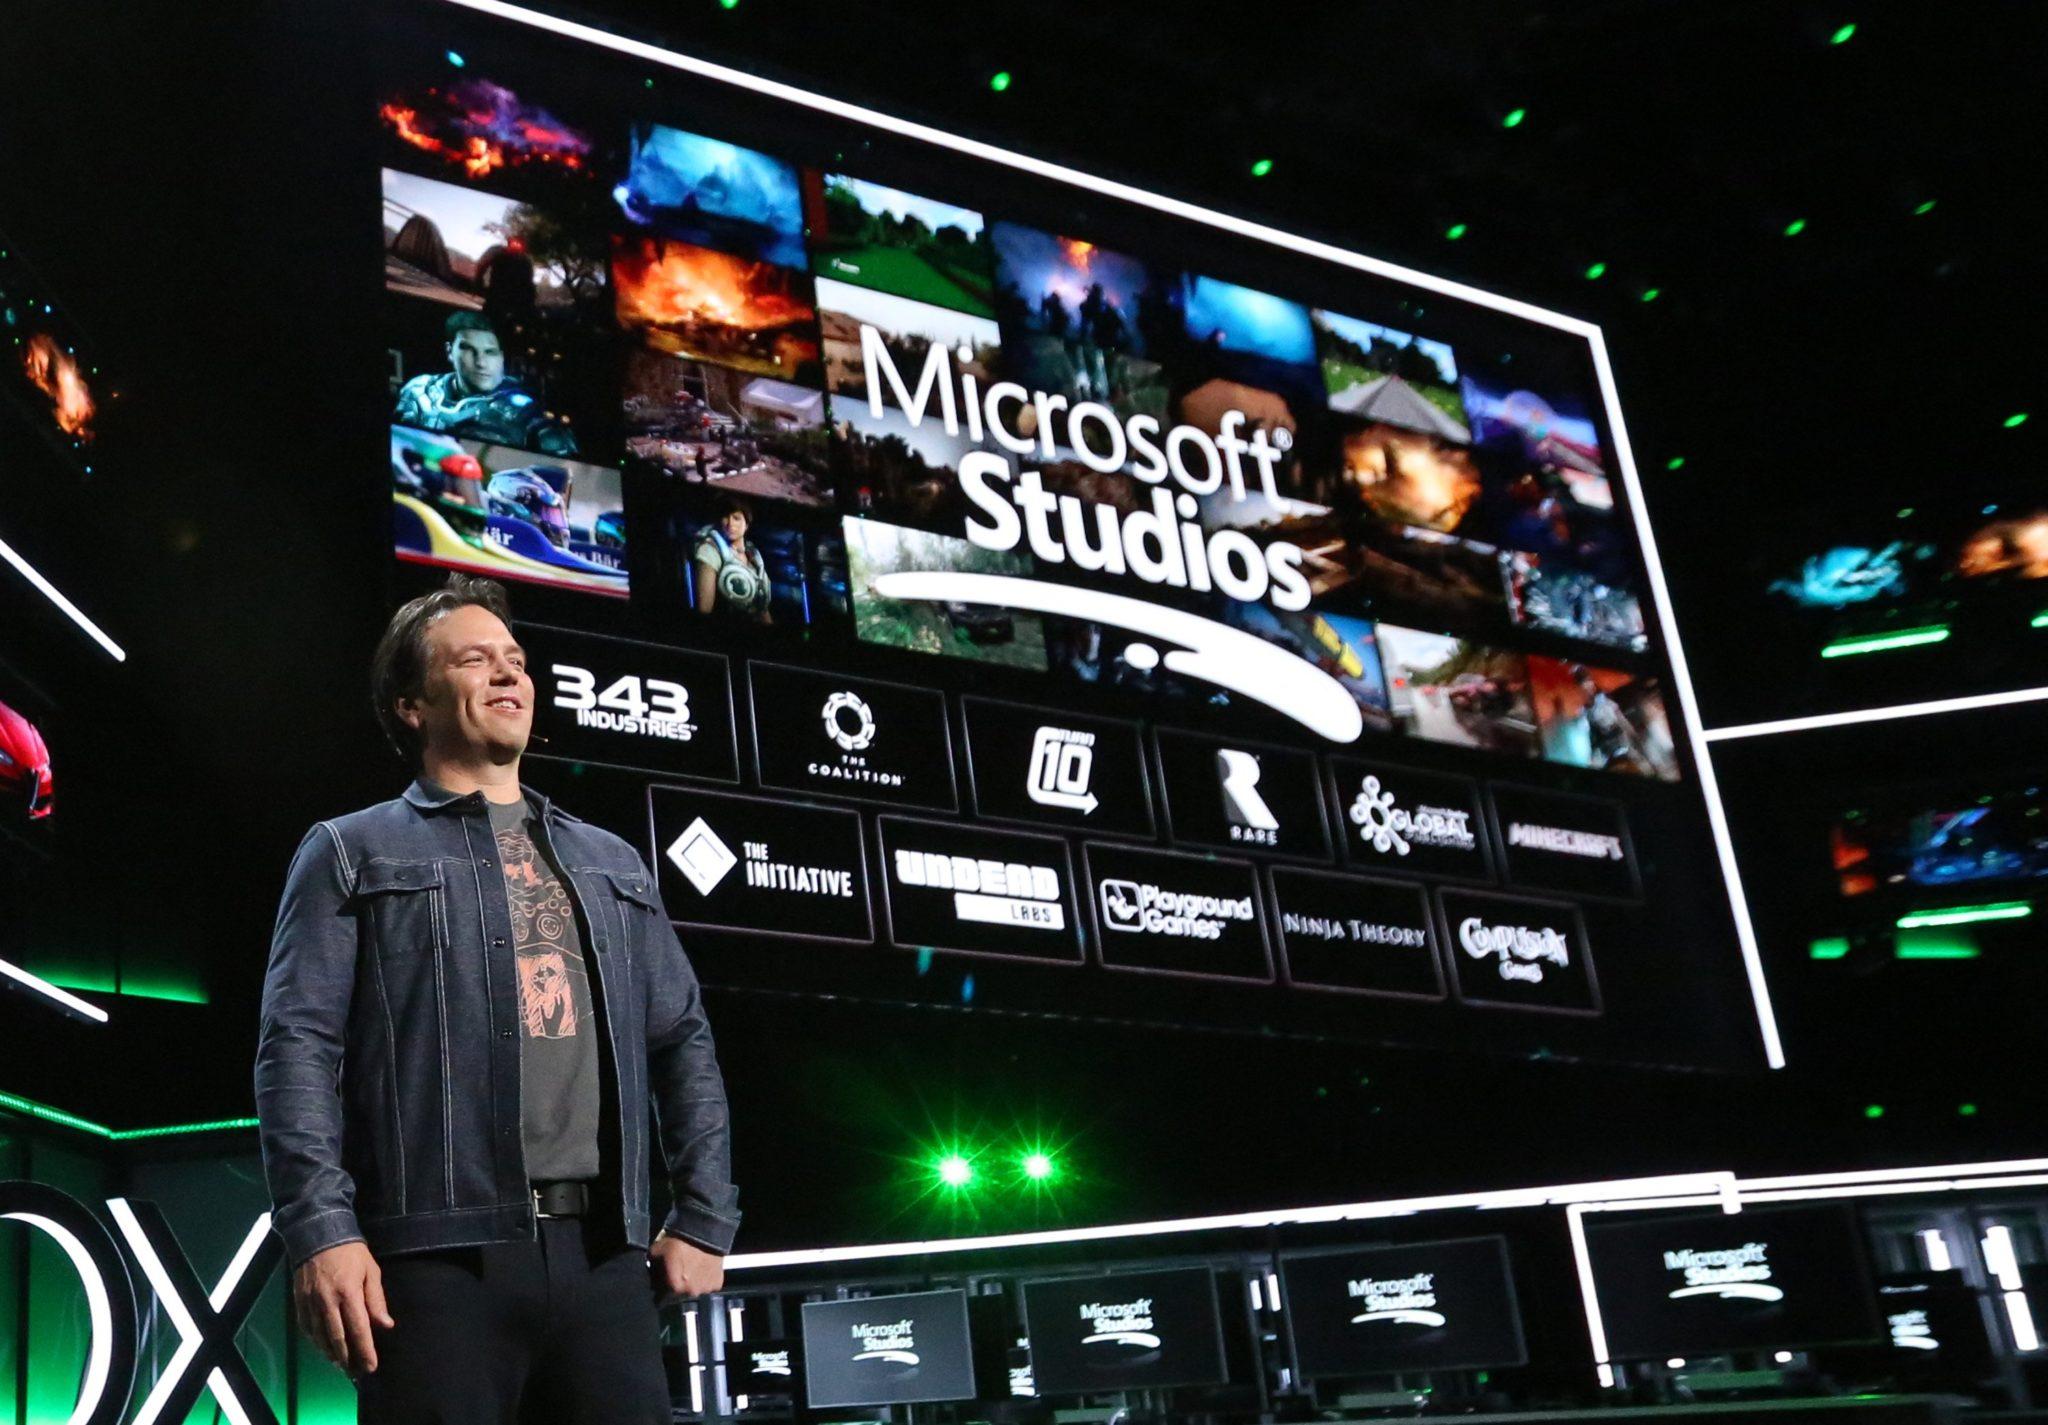 Xbox, Microsoft, E3 2019, Gaming